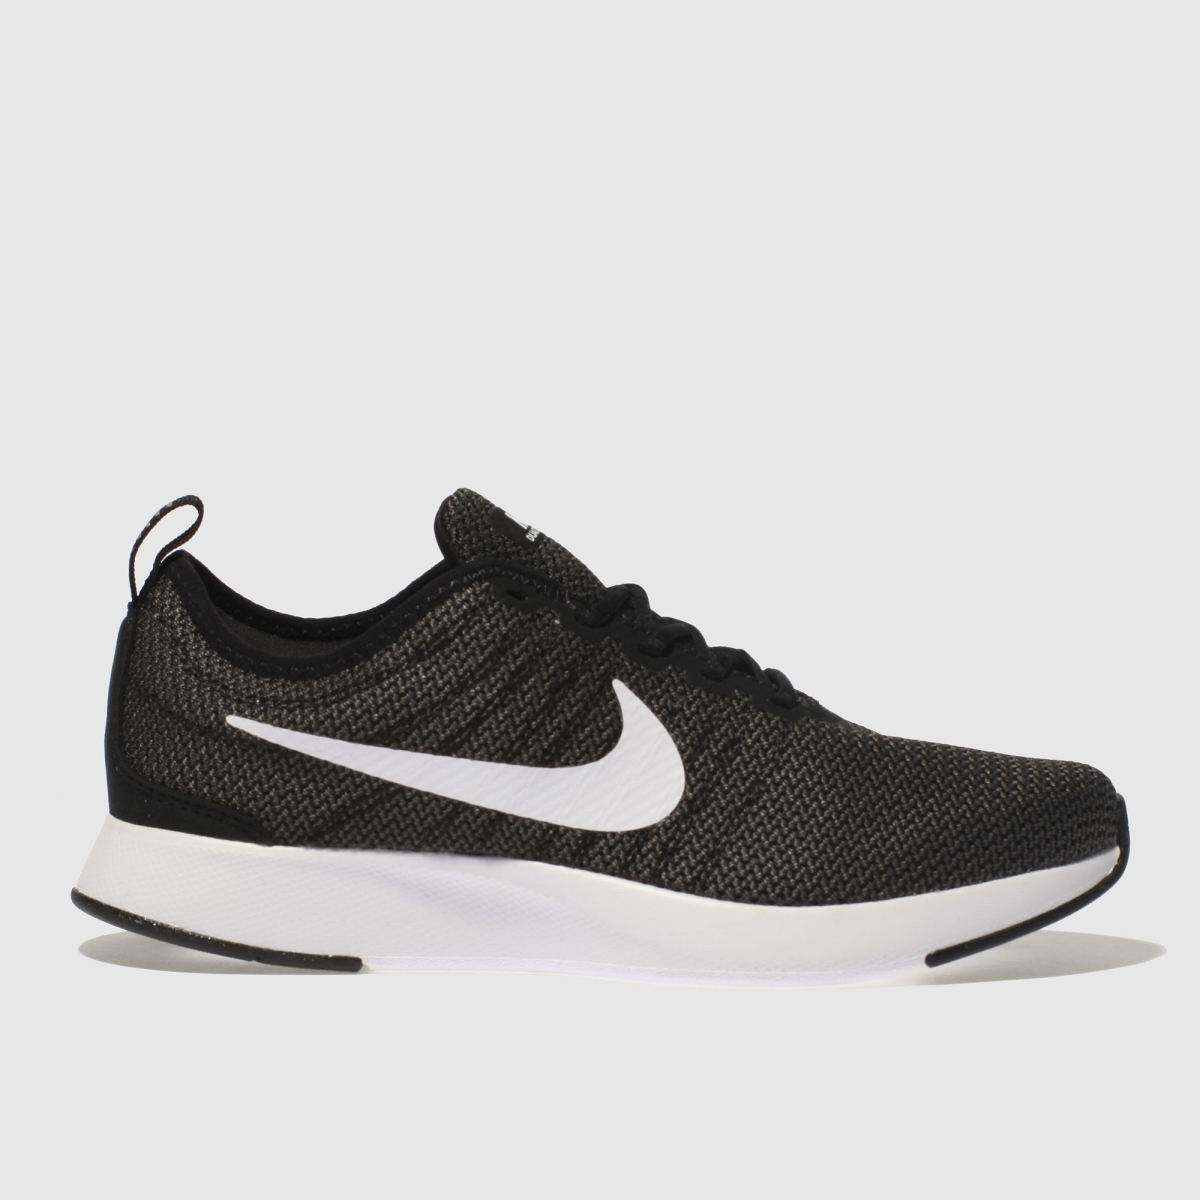 Nike Black & White Dualtone Racer Trainers Youth